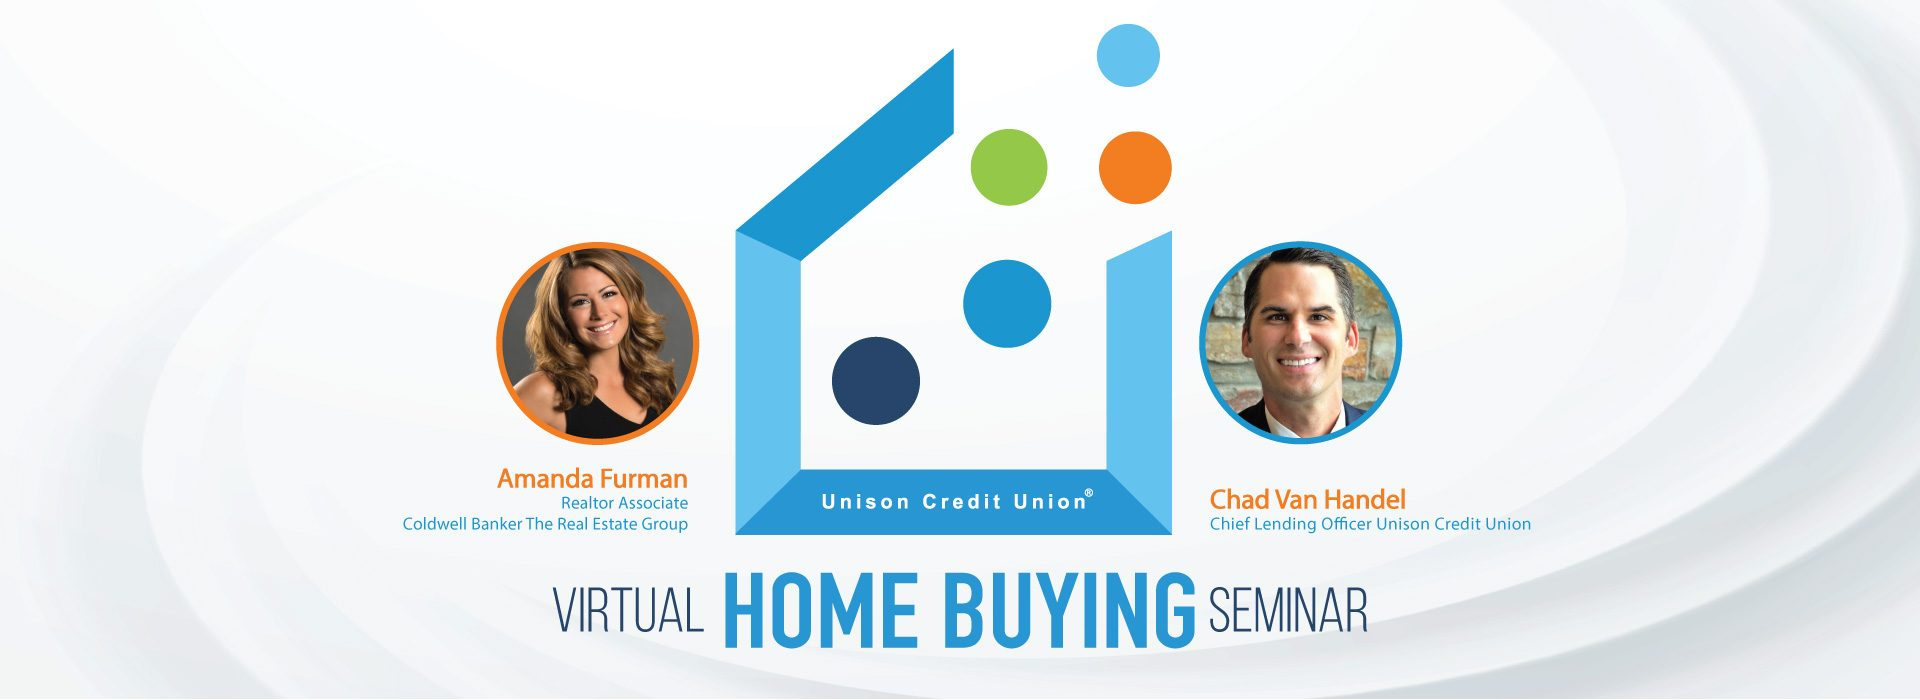 Virtual Home Buying Webniar